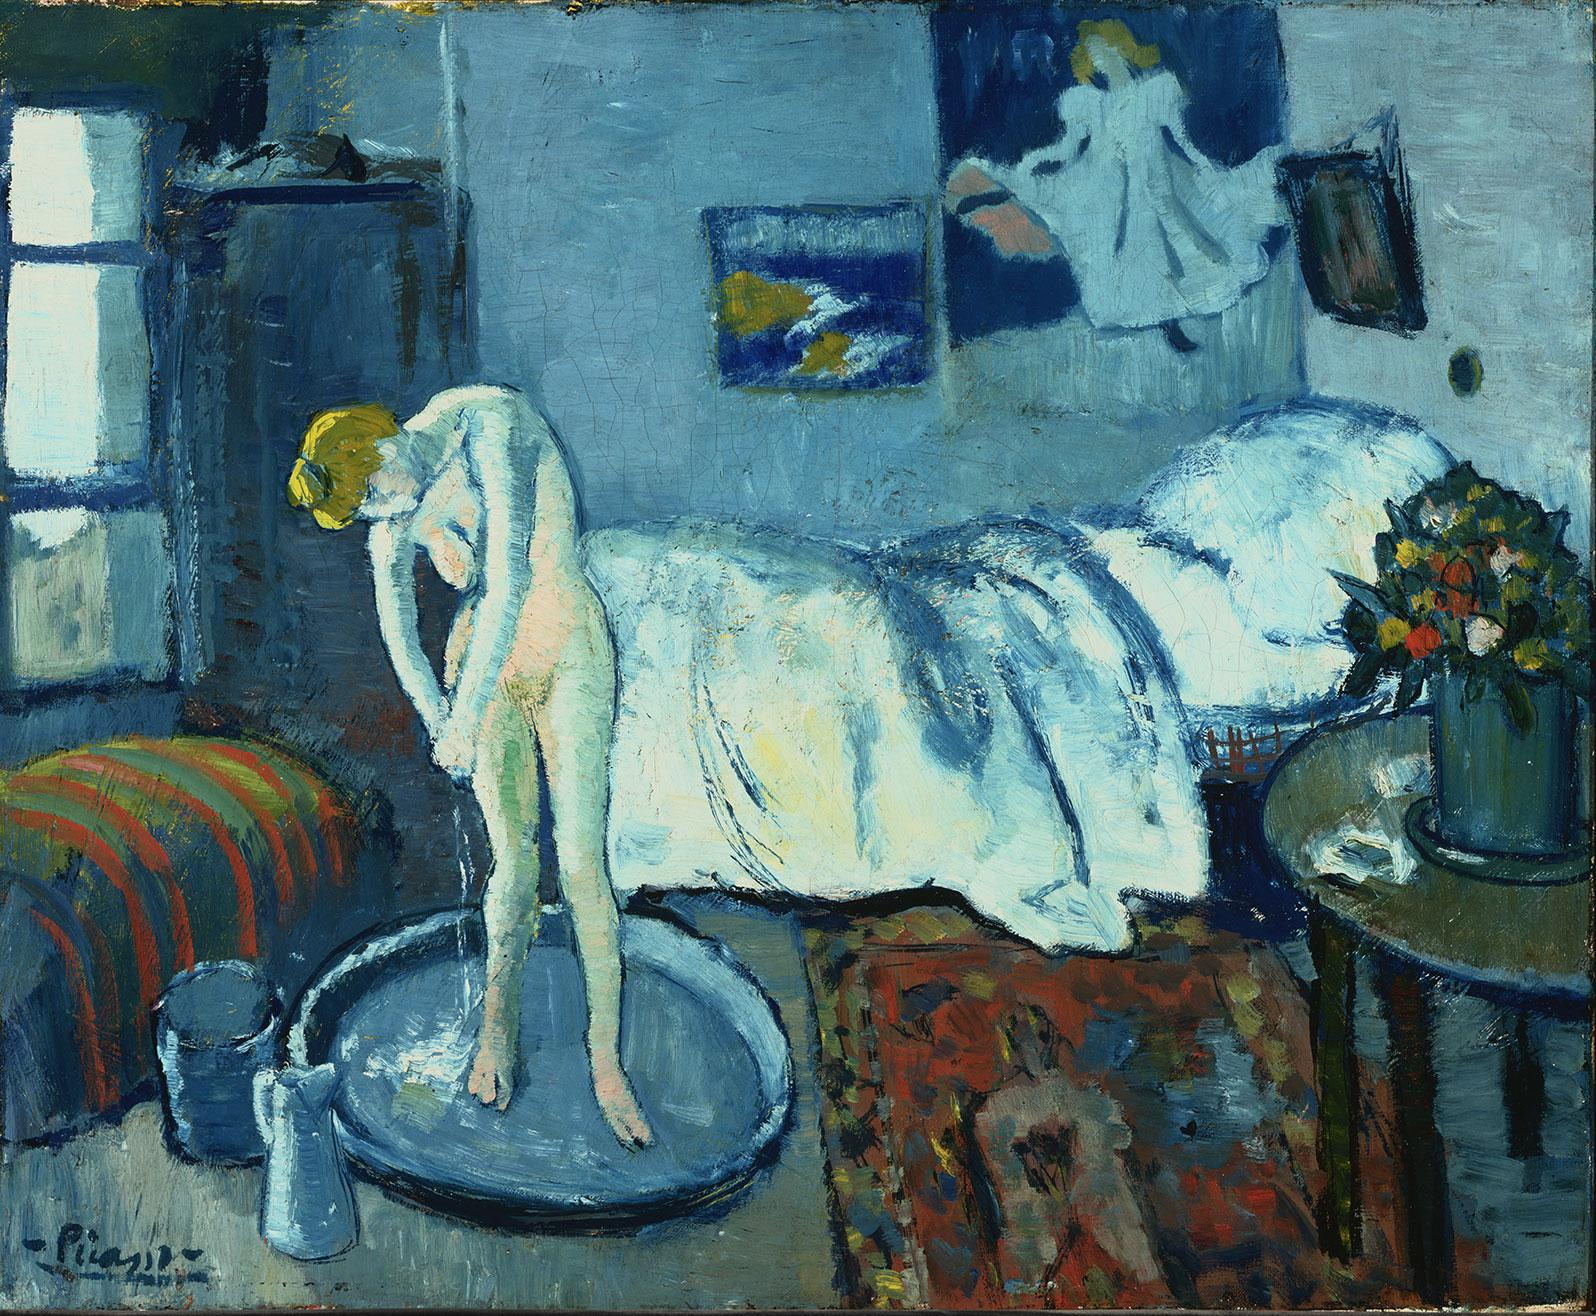 Flat Sweet Home - Impresionistas y Modernos - Caixa Fòrum